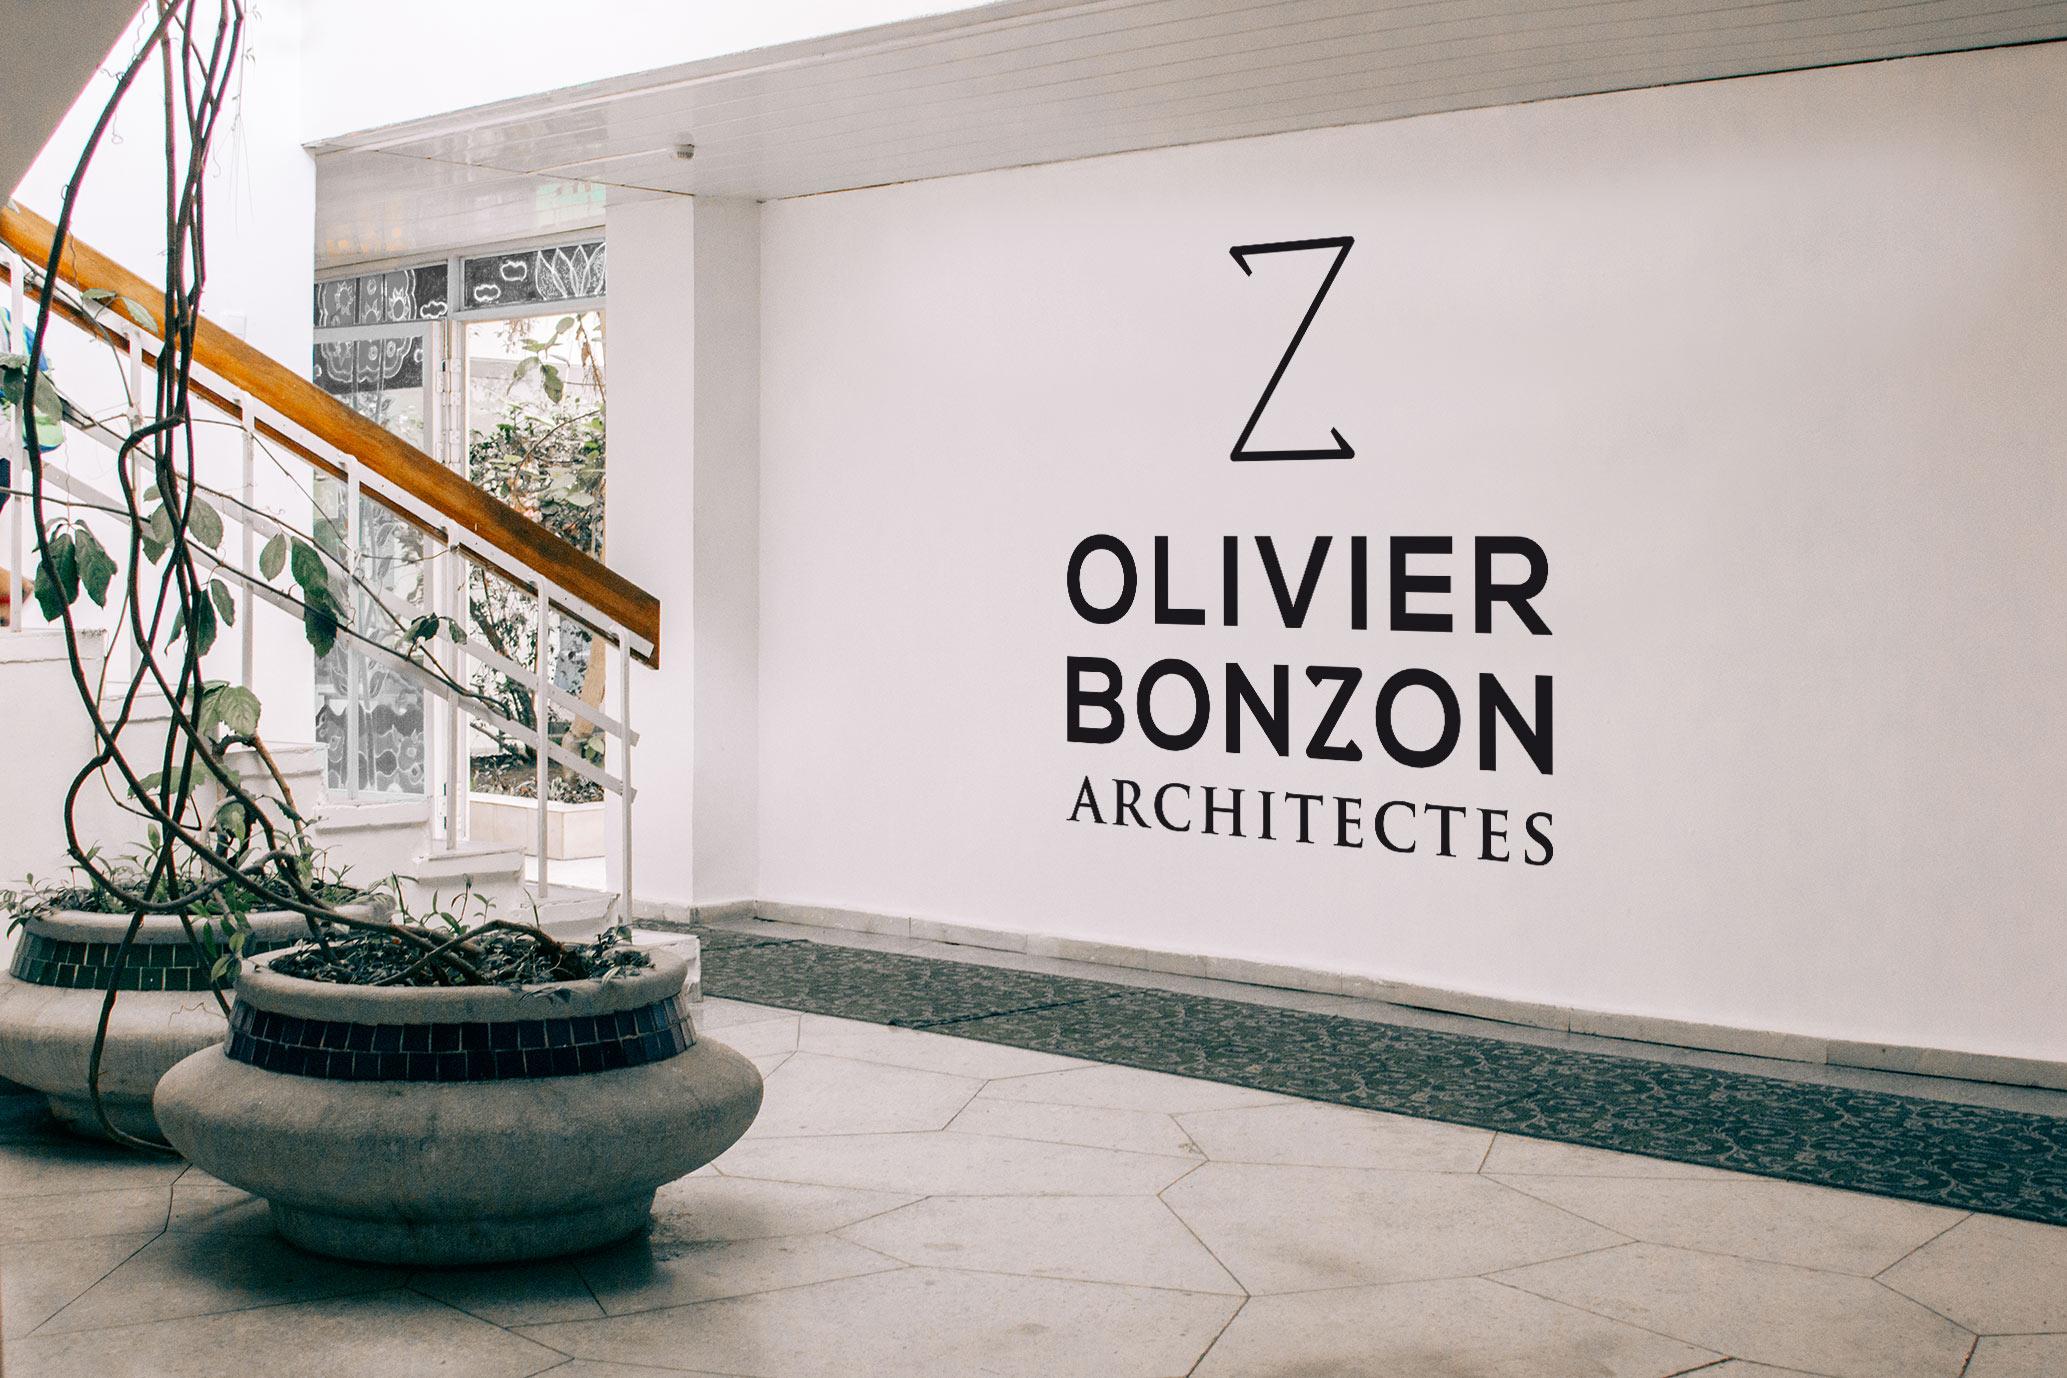 Olivier_Bonzon-Architectes_logo_mur_1